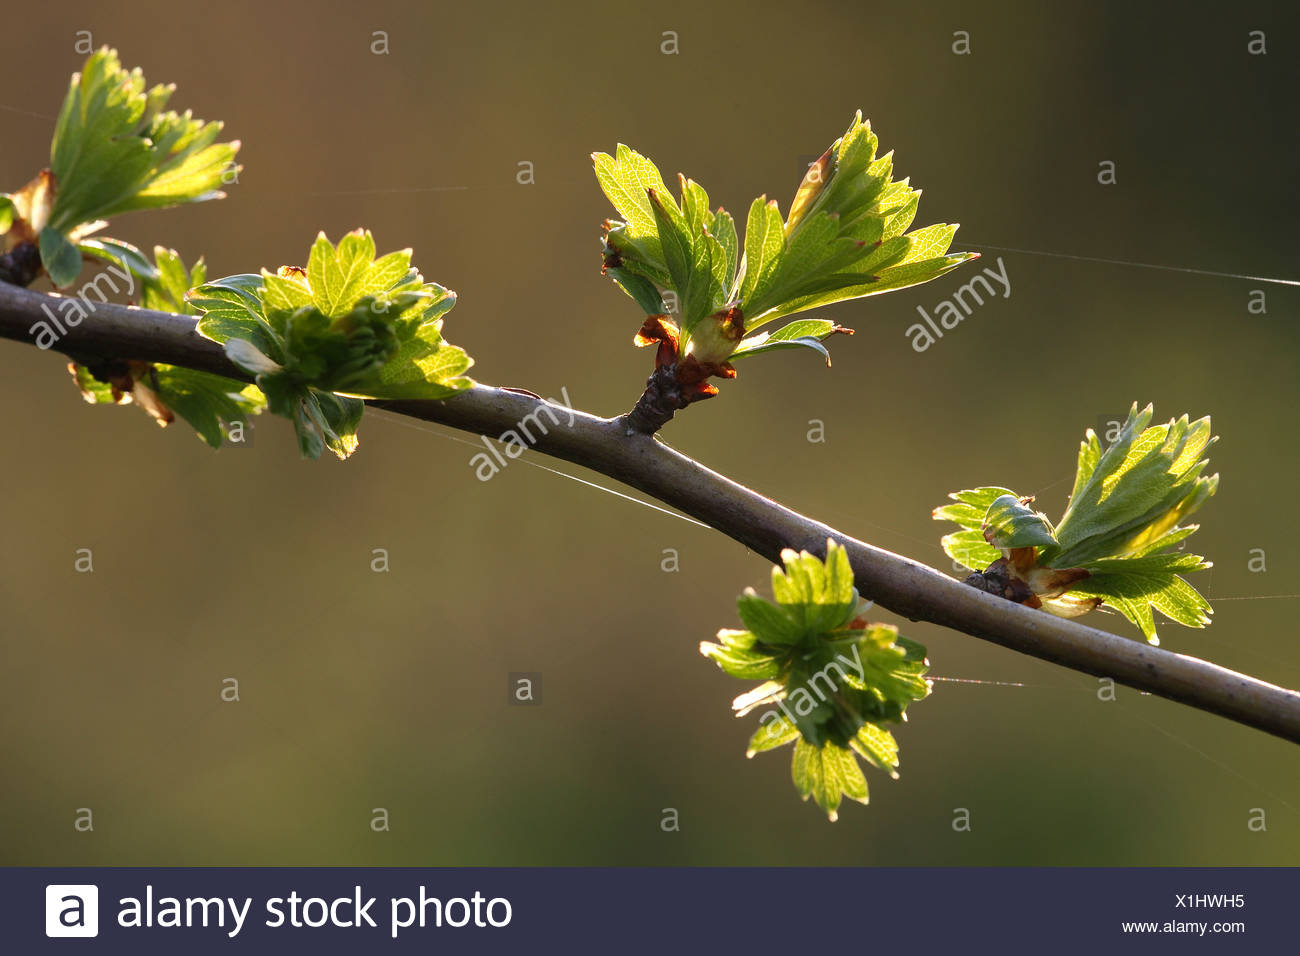 Van Bladeren Meidoorn (Crataegus monogyna) de lente, Belgi hojas de espino albar (Crataegus monogyna) en primavera, Bélgica Imagen De Stock